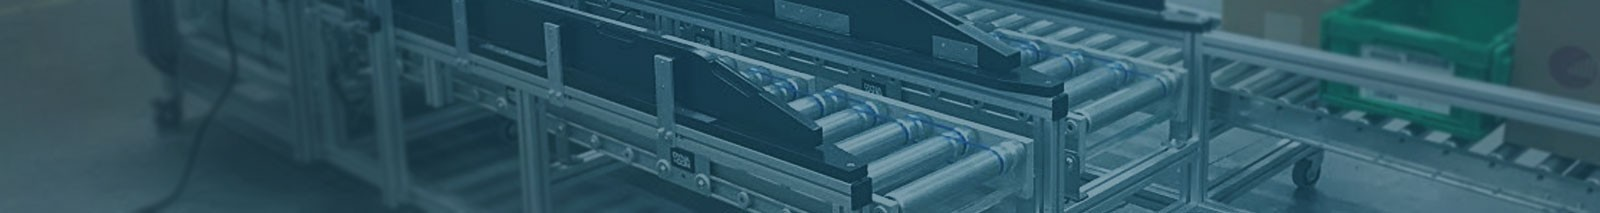 Box Filling Conveyors